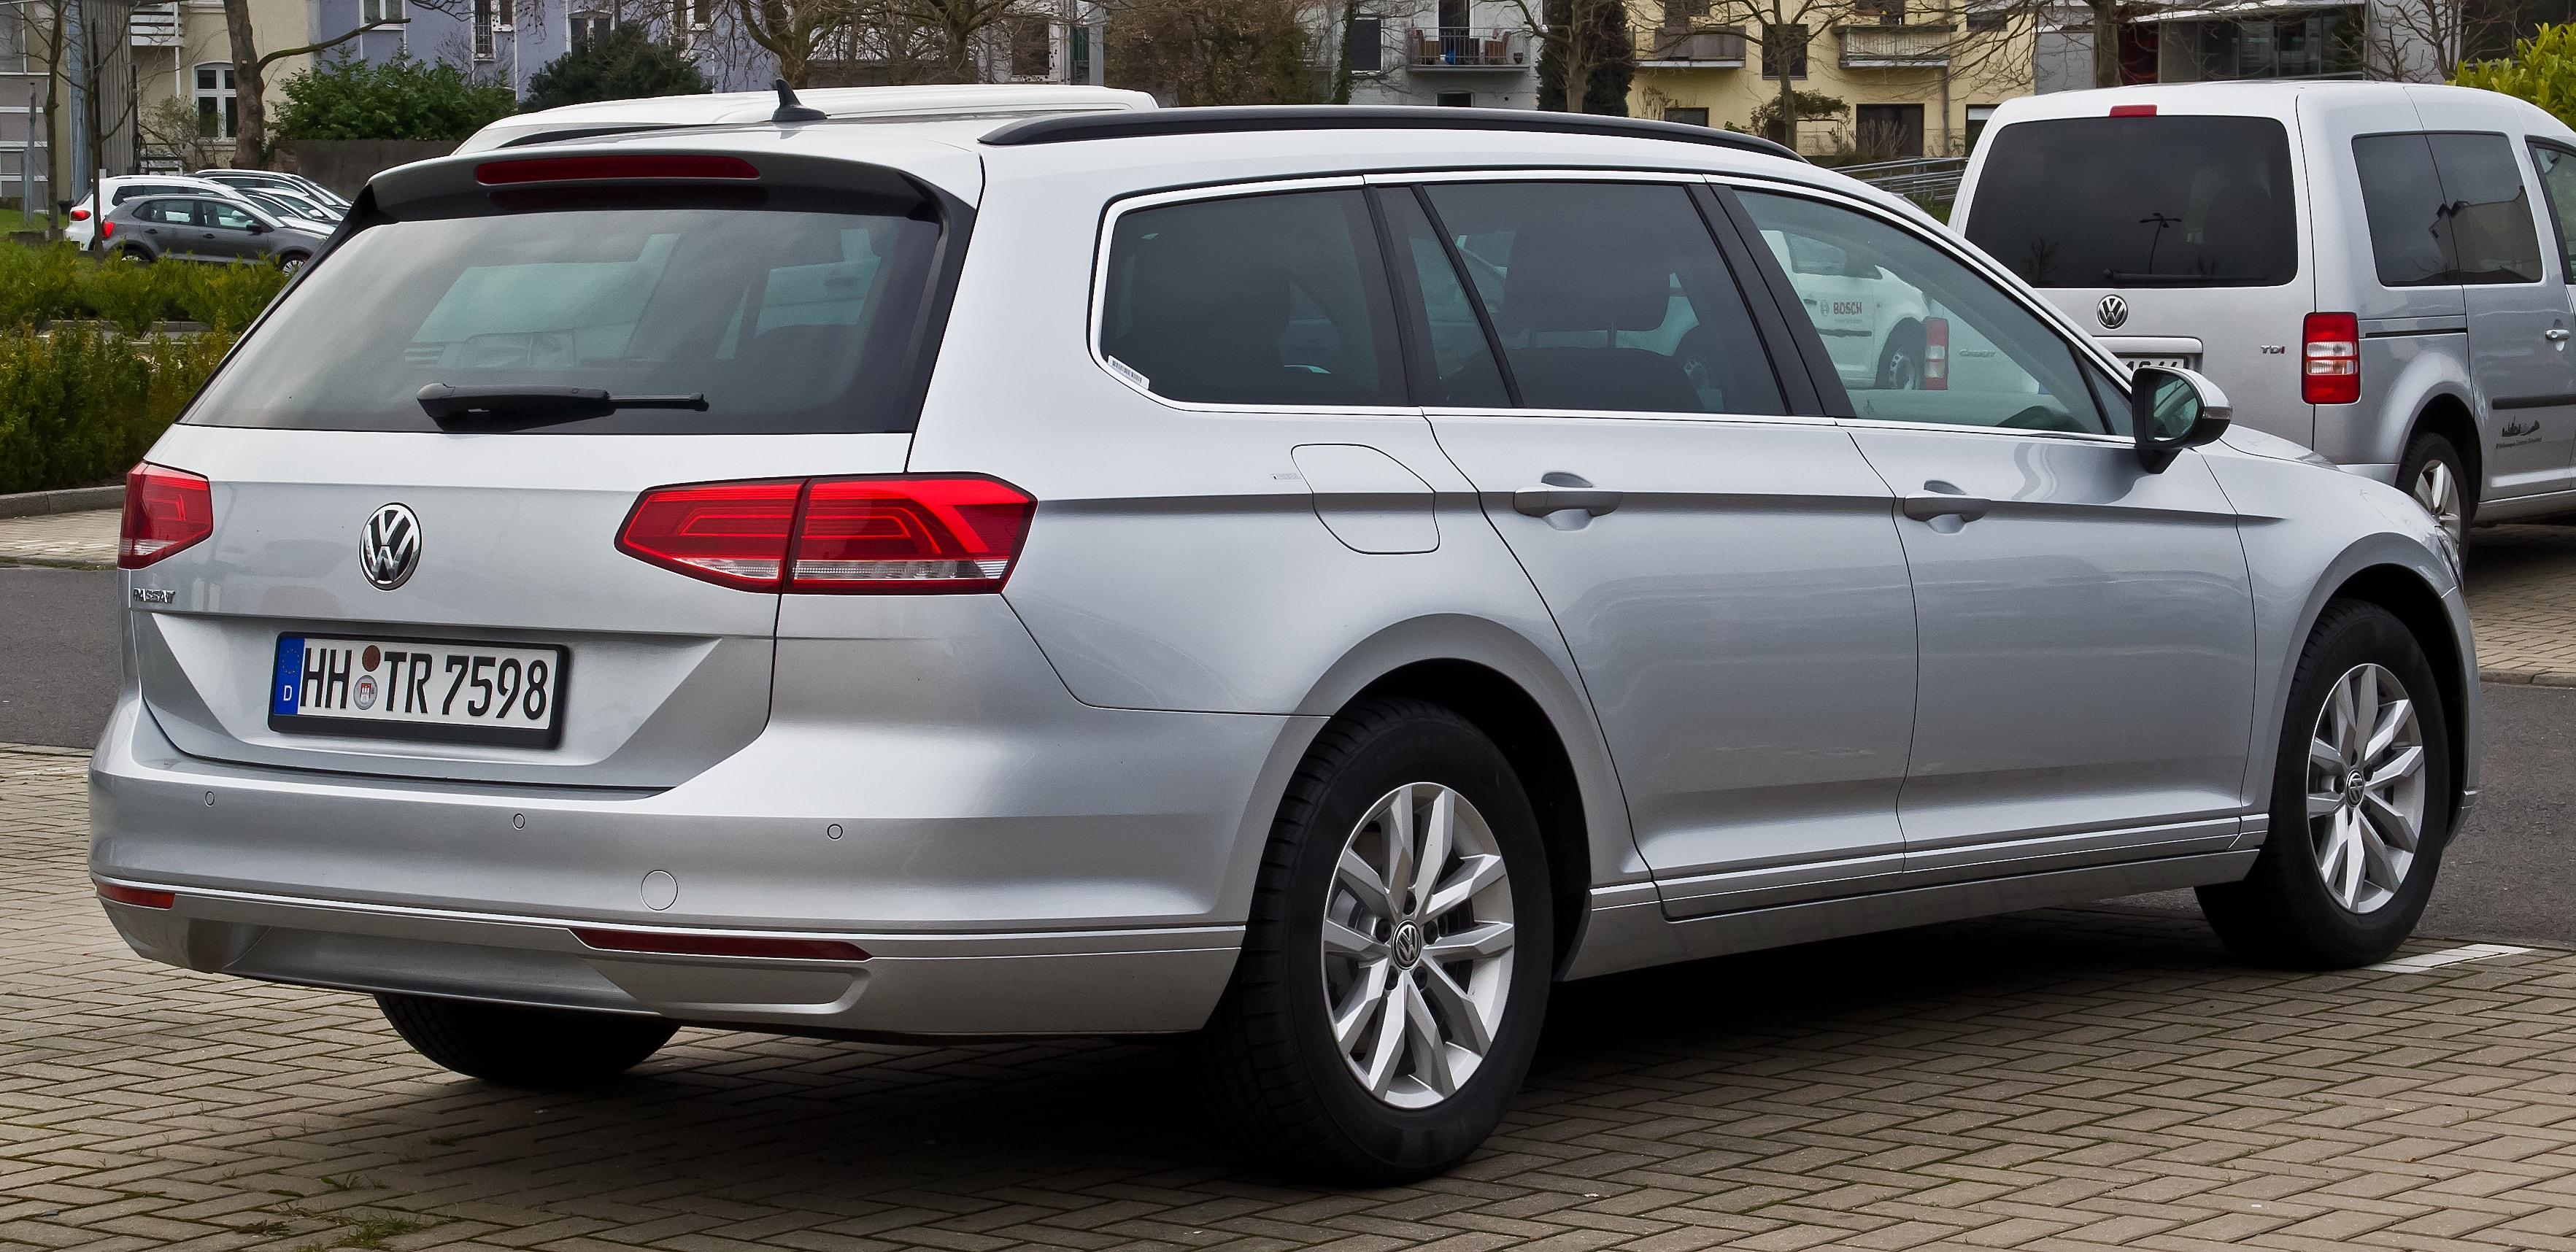 Volkswagen Passat B8 Alltrack High